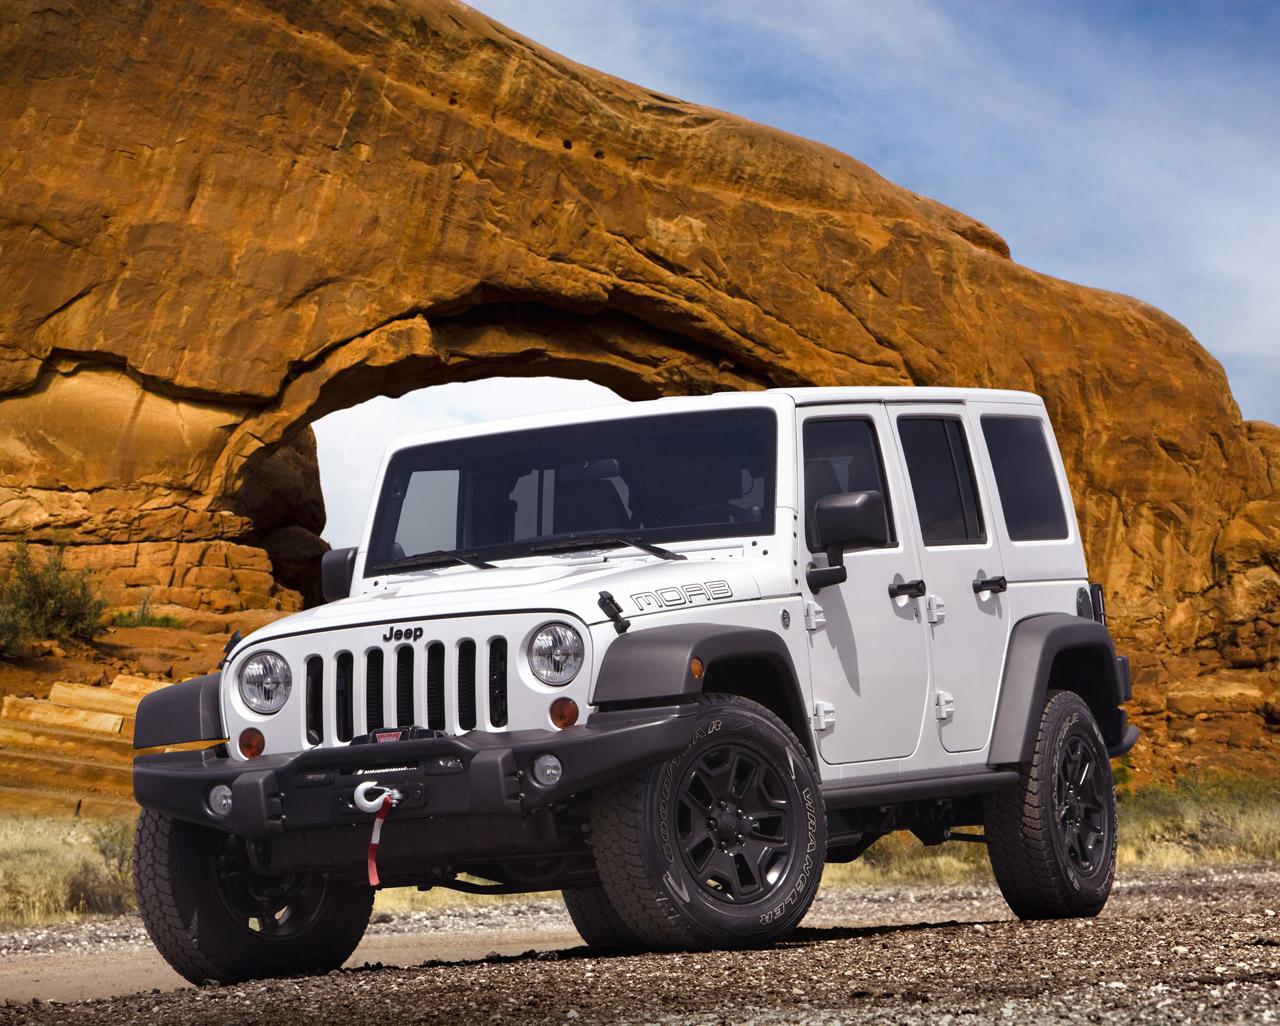 jeep wrangler moab special edition unveiled autoevolution. Black Bedroom Furniture Sets. Home Design Ideas